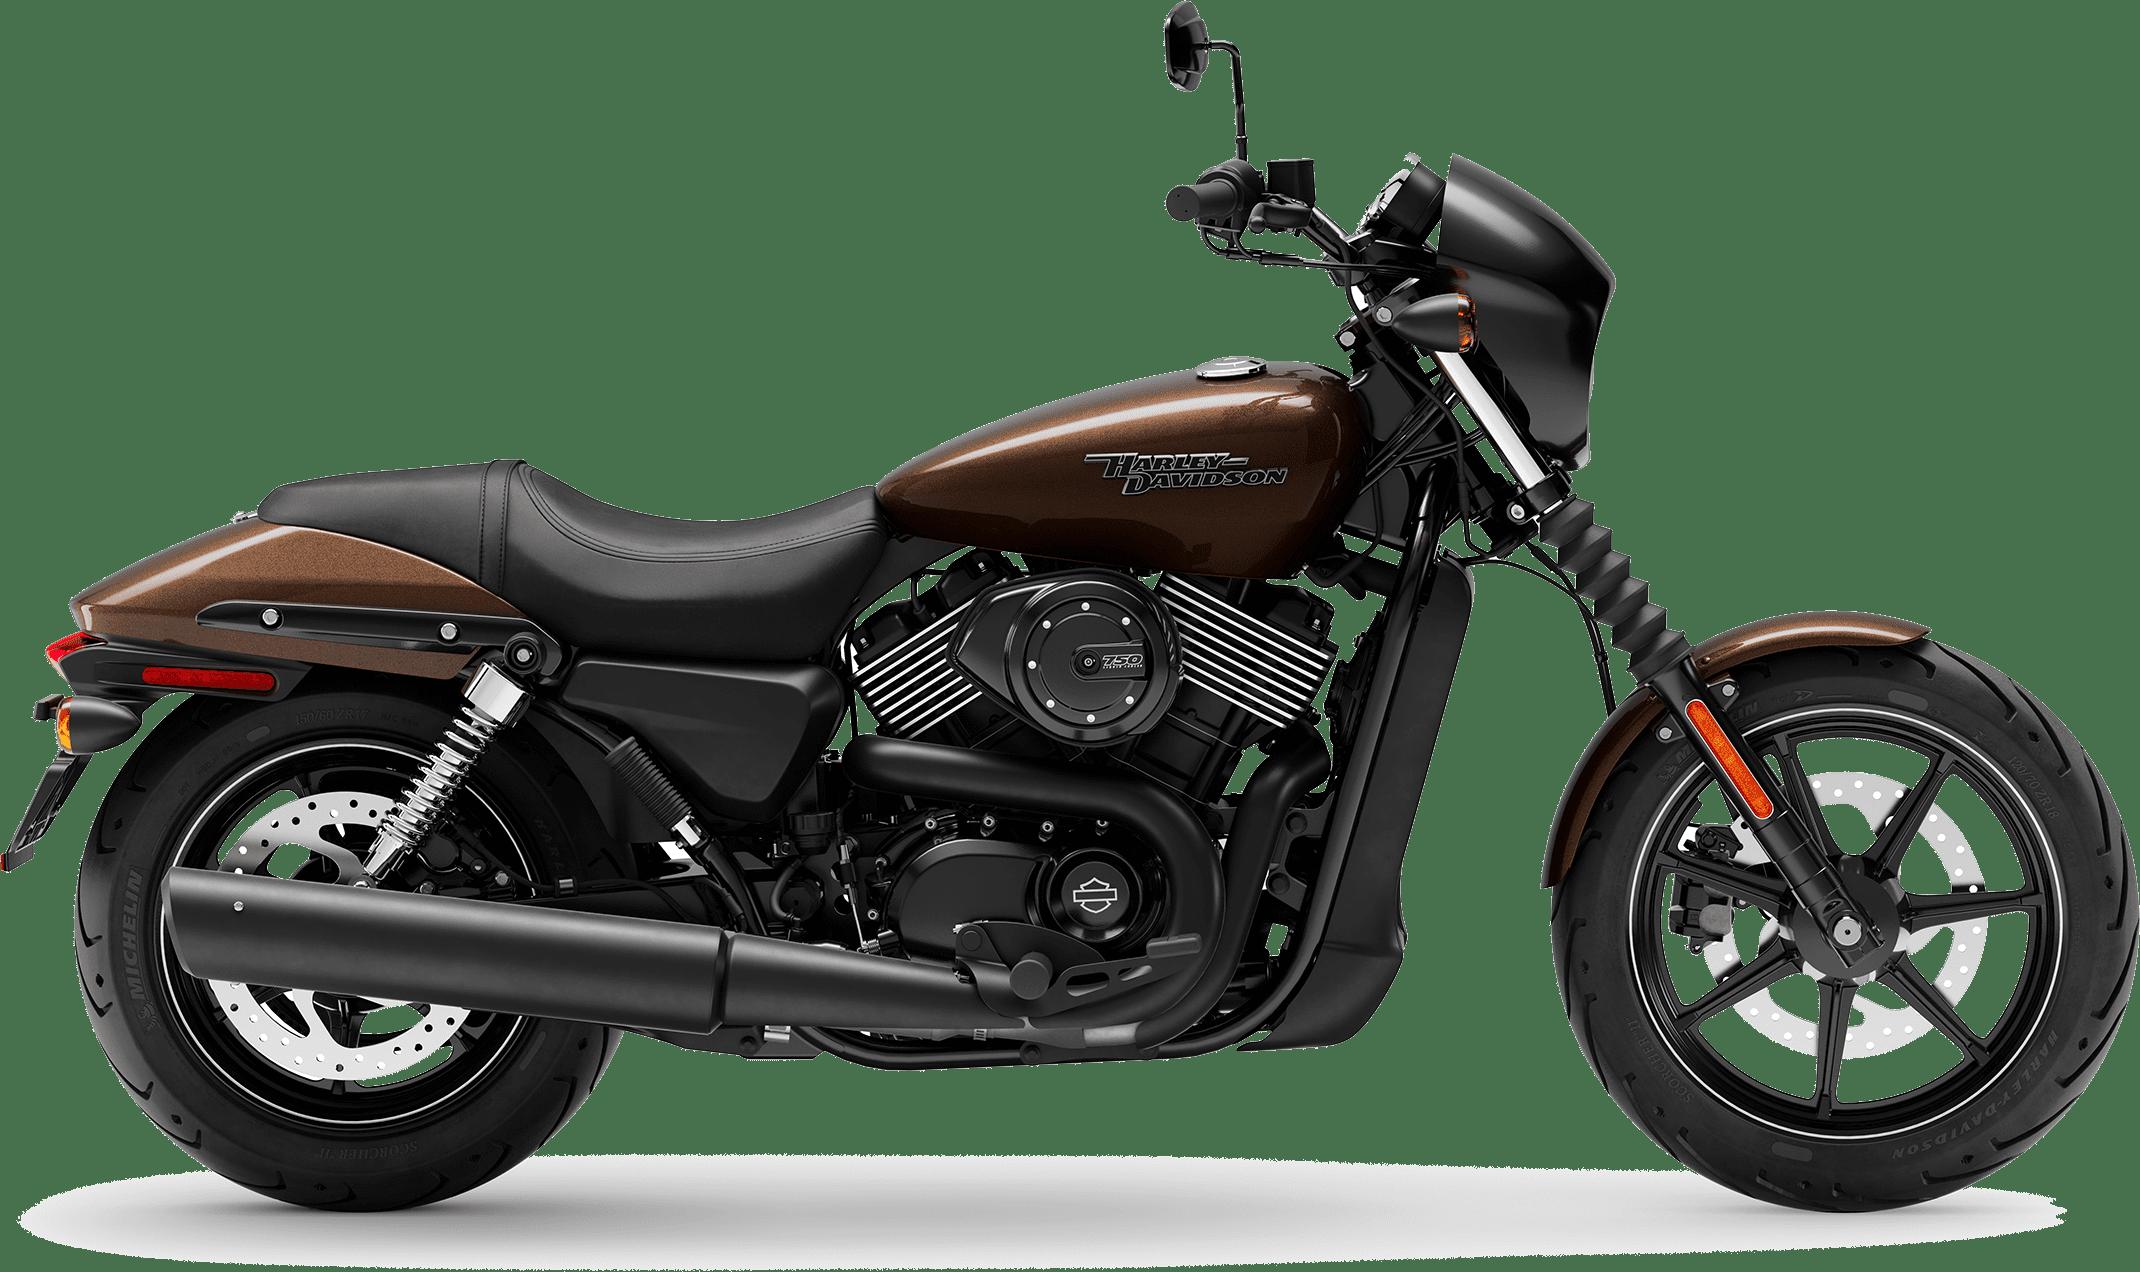 2019 Harley-Davidson H-D Street 750 Rawhide